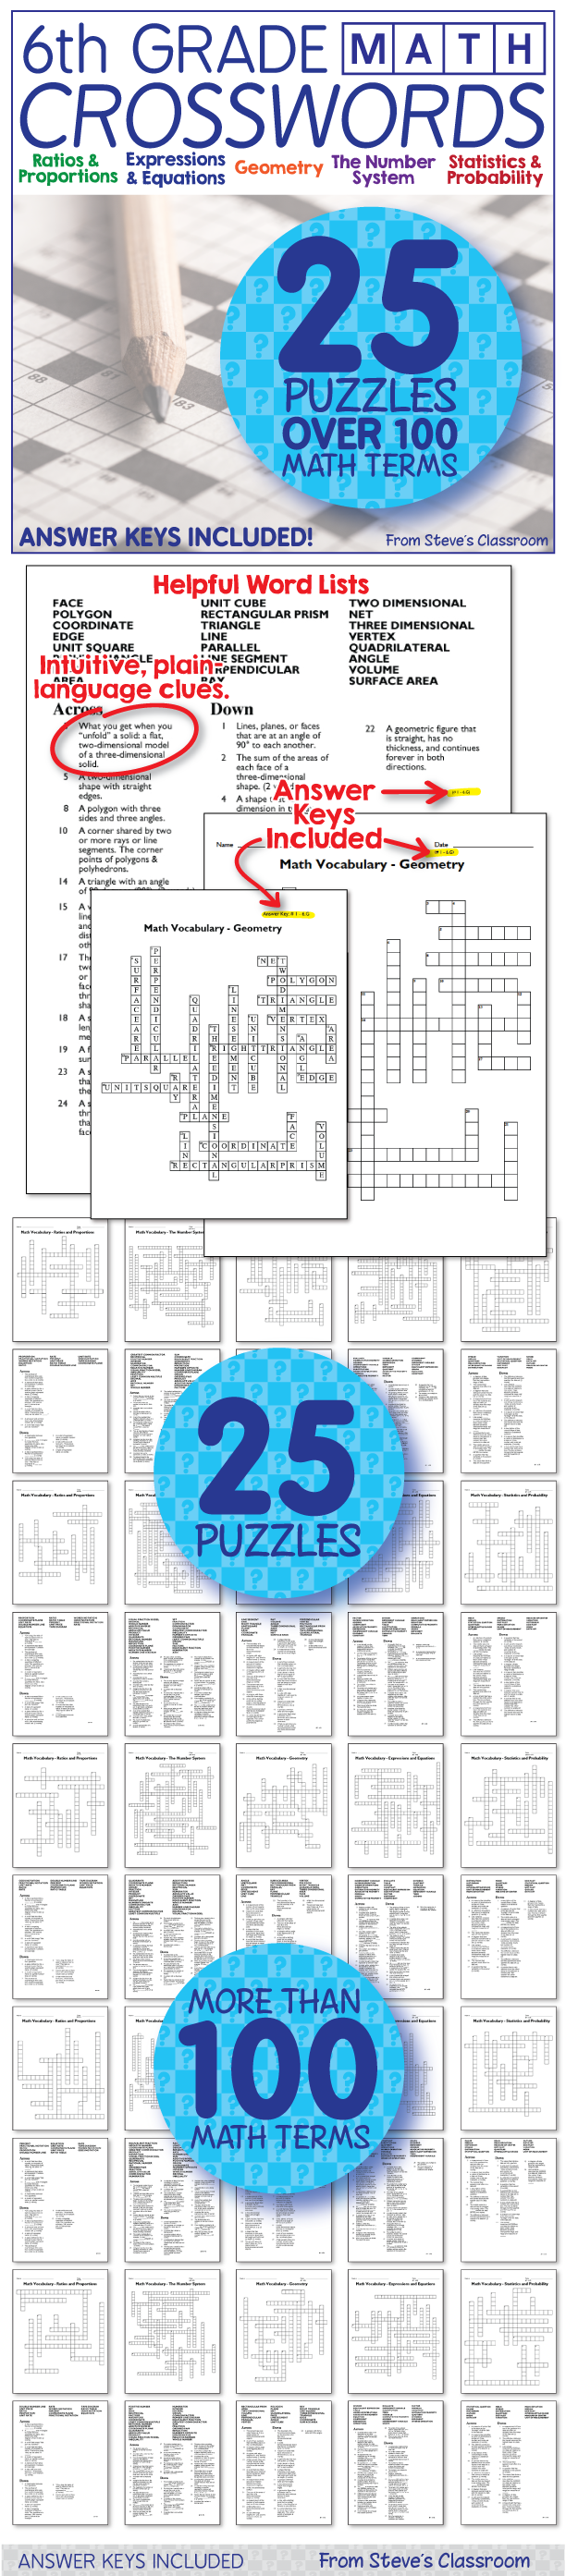 Math Worksheets - 6th Grade Math Vocabulary Crossword